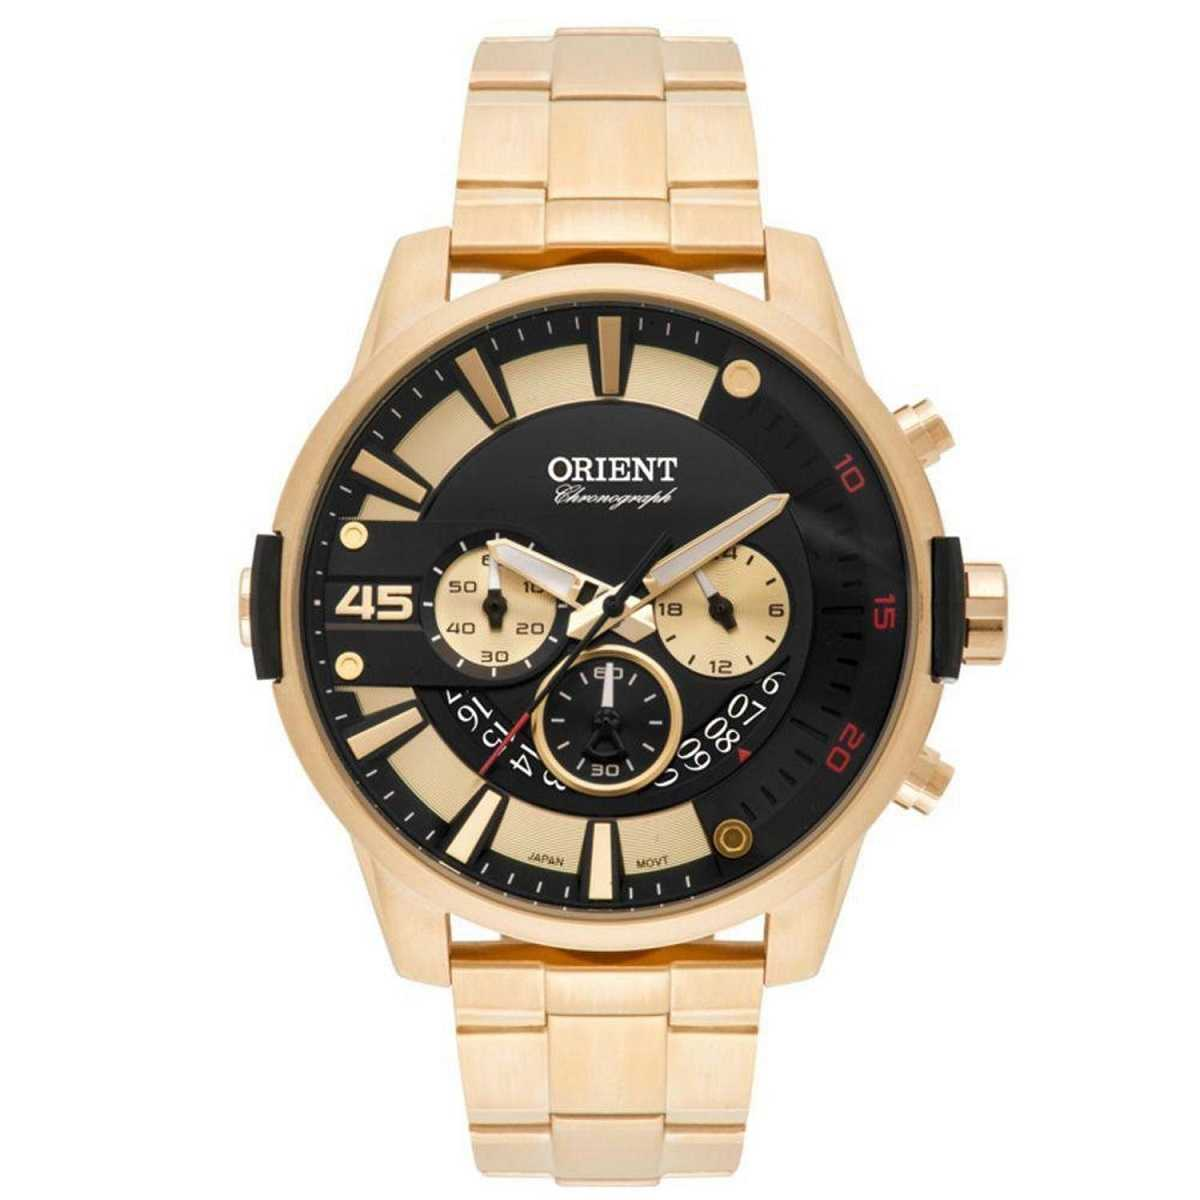 Relógio Orient Masculino Cronógrafo Dourado MGSSC026 P2KX